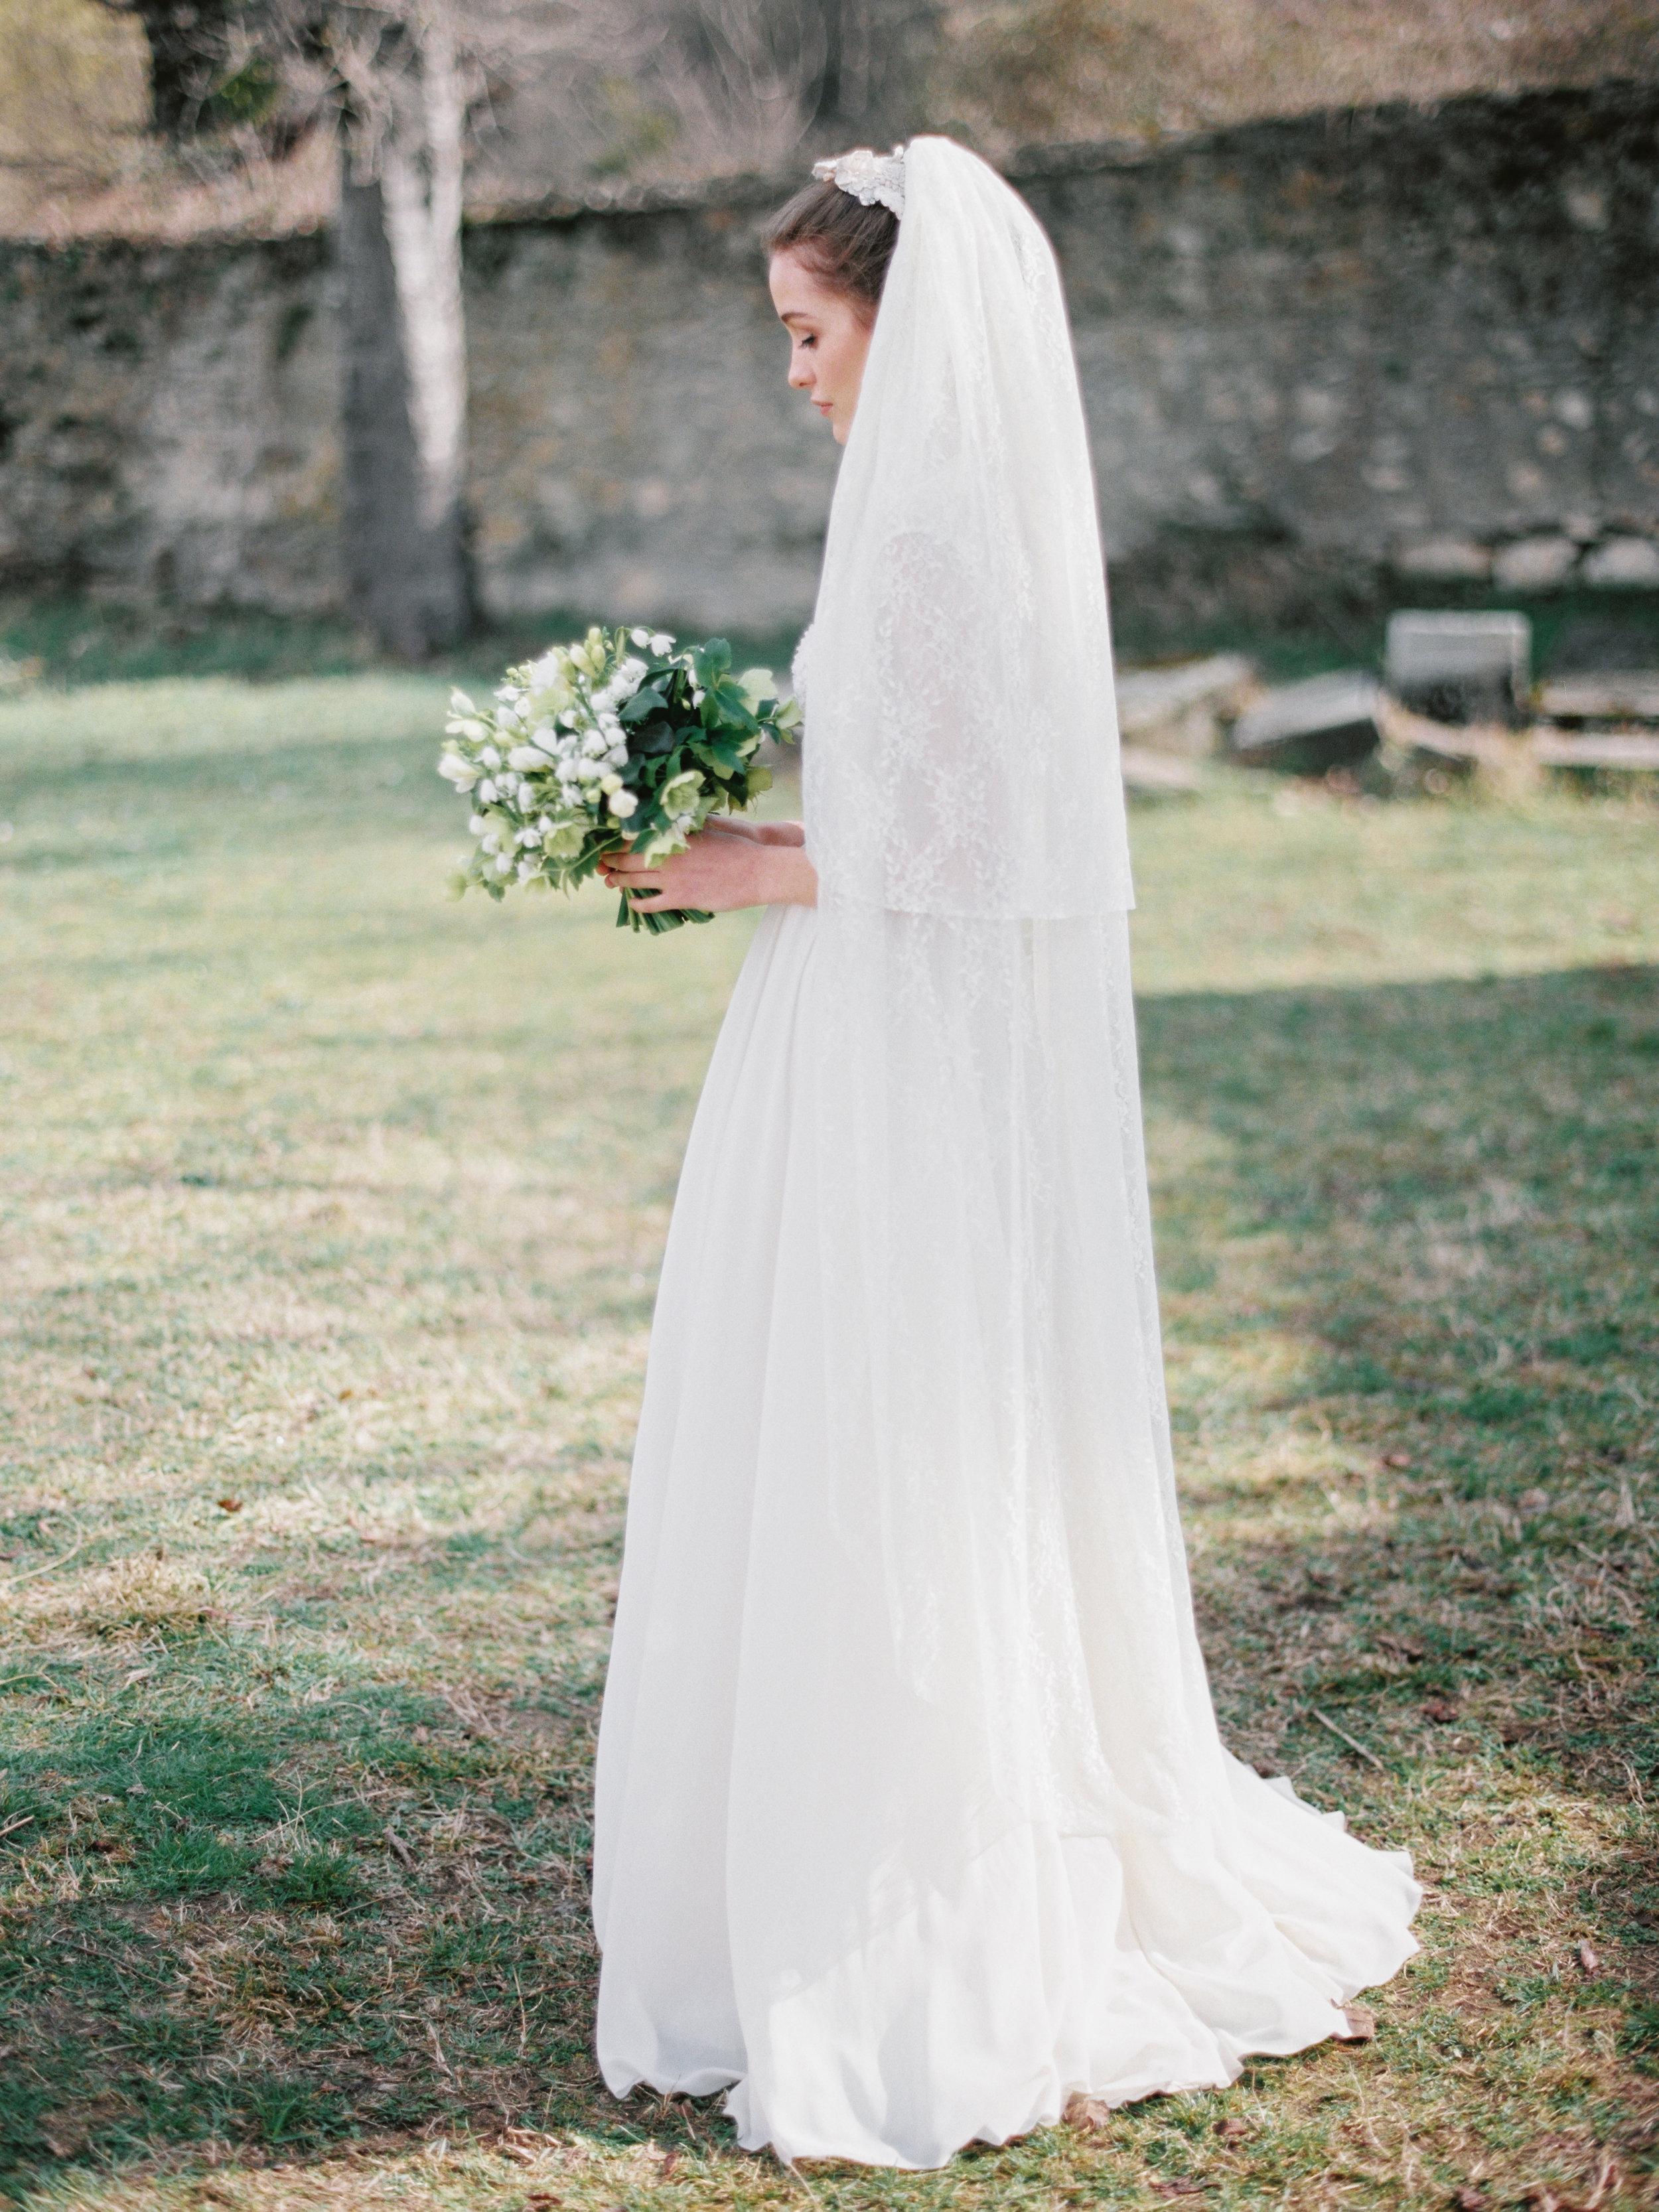 TamaraGigolaphotography,Cathytelle,royalweddingdress,kakheti-0038-3.JPG